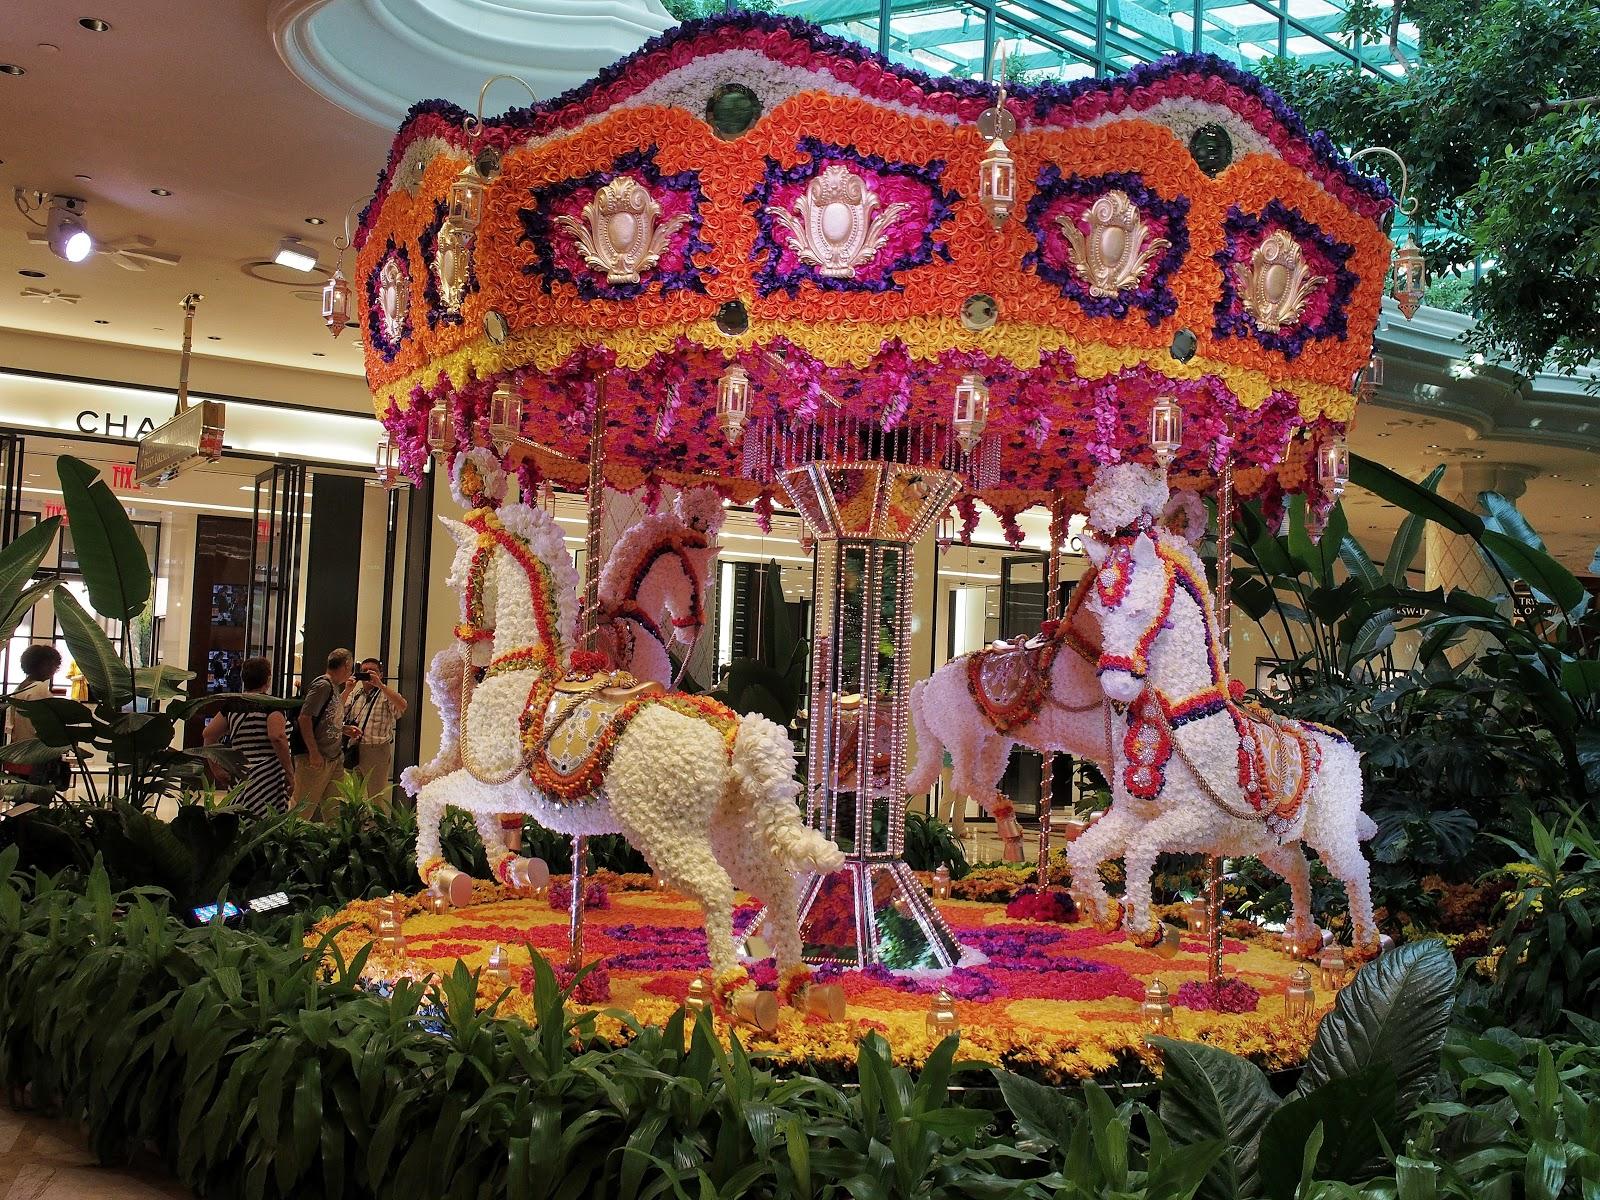 Carousel, #carousel #wynn #lasvegas #flowers #mirror